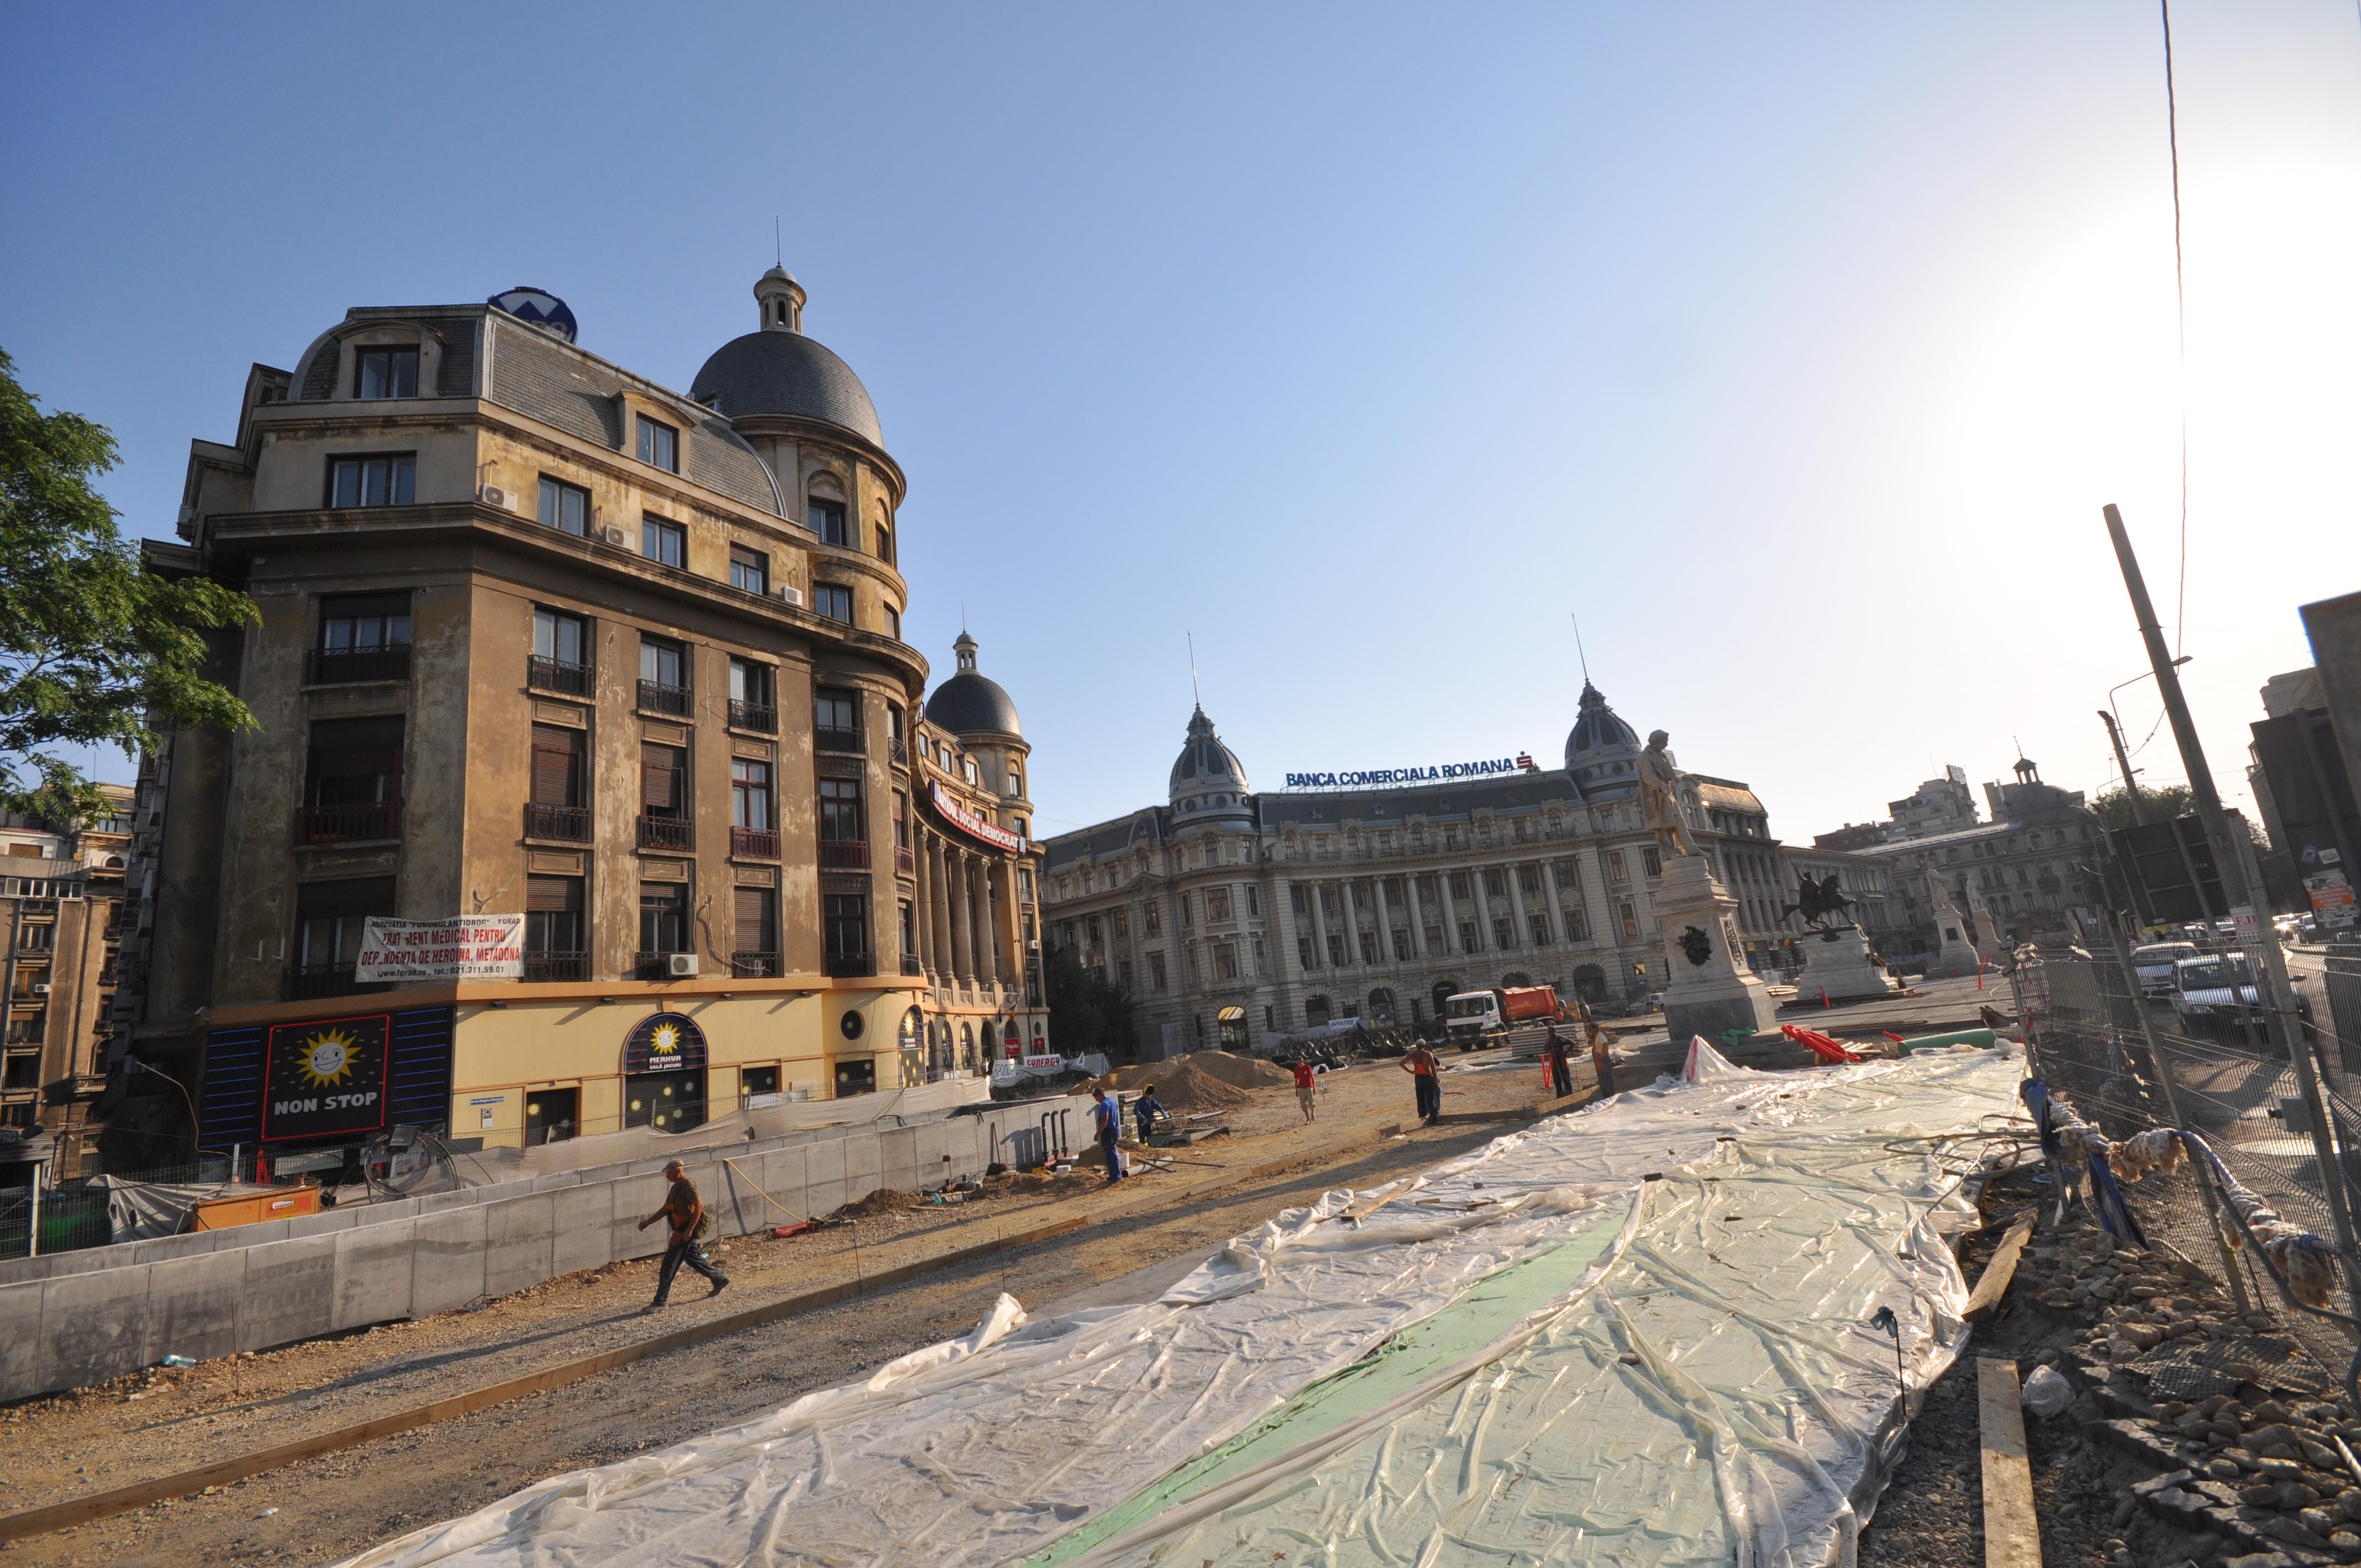 University Square being renovated (11320903943).jpg University Square (Romanian: Piaţa Universităţii) is located in downtown Bucharest, near